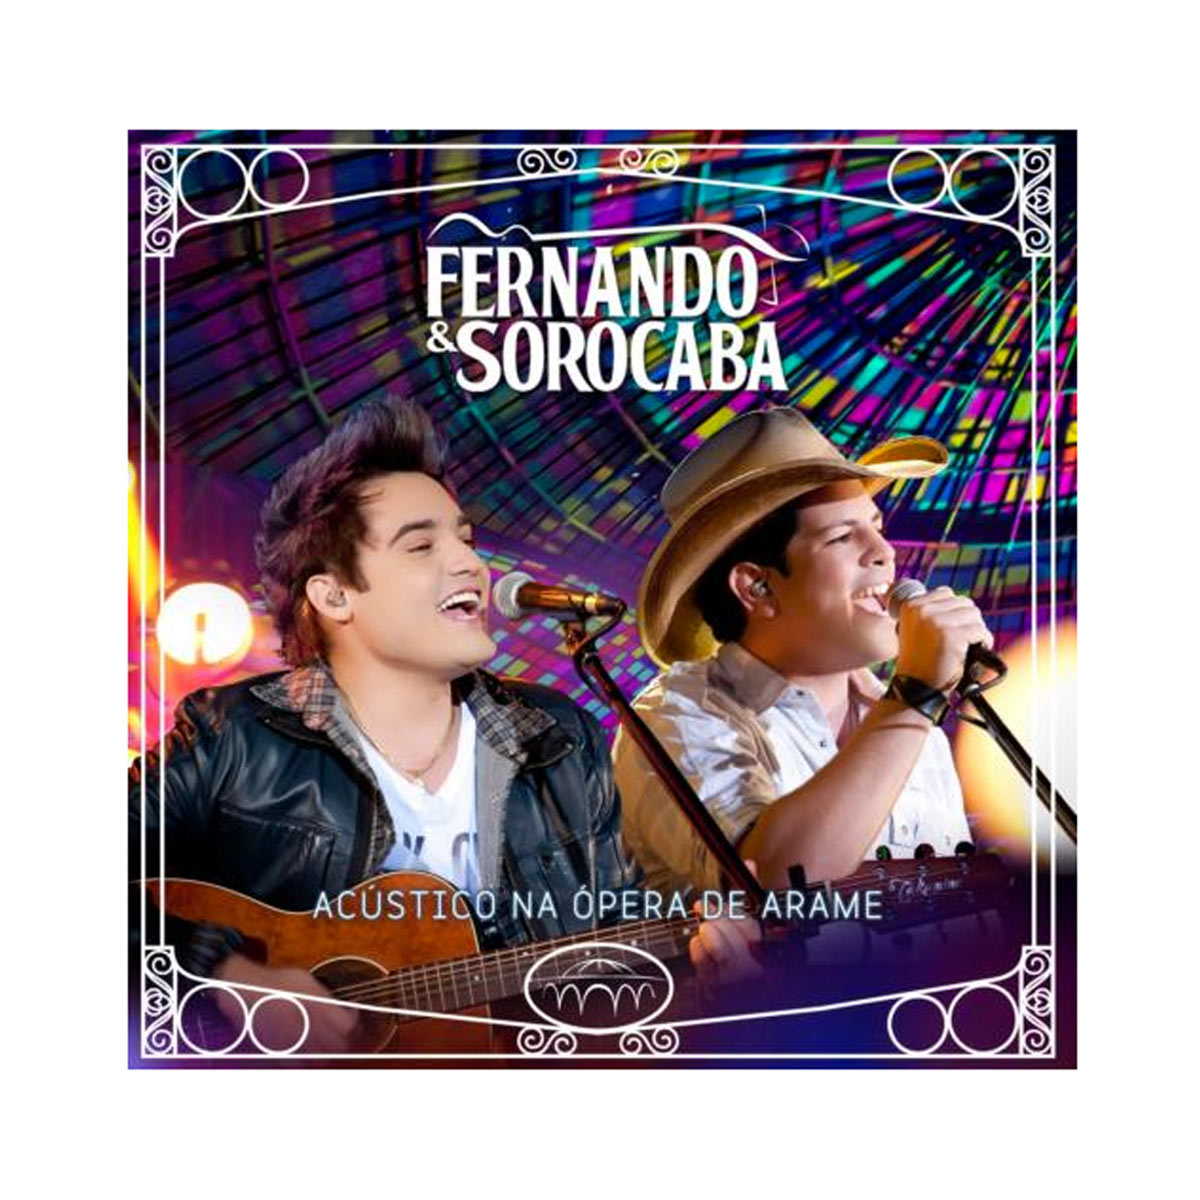 CD Fernando  Sorocaba �pera de Arame